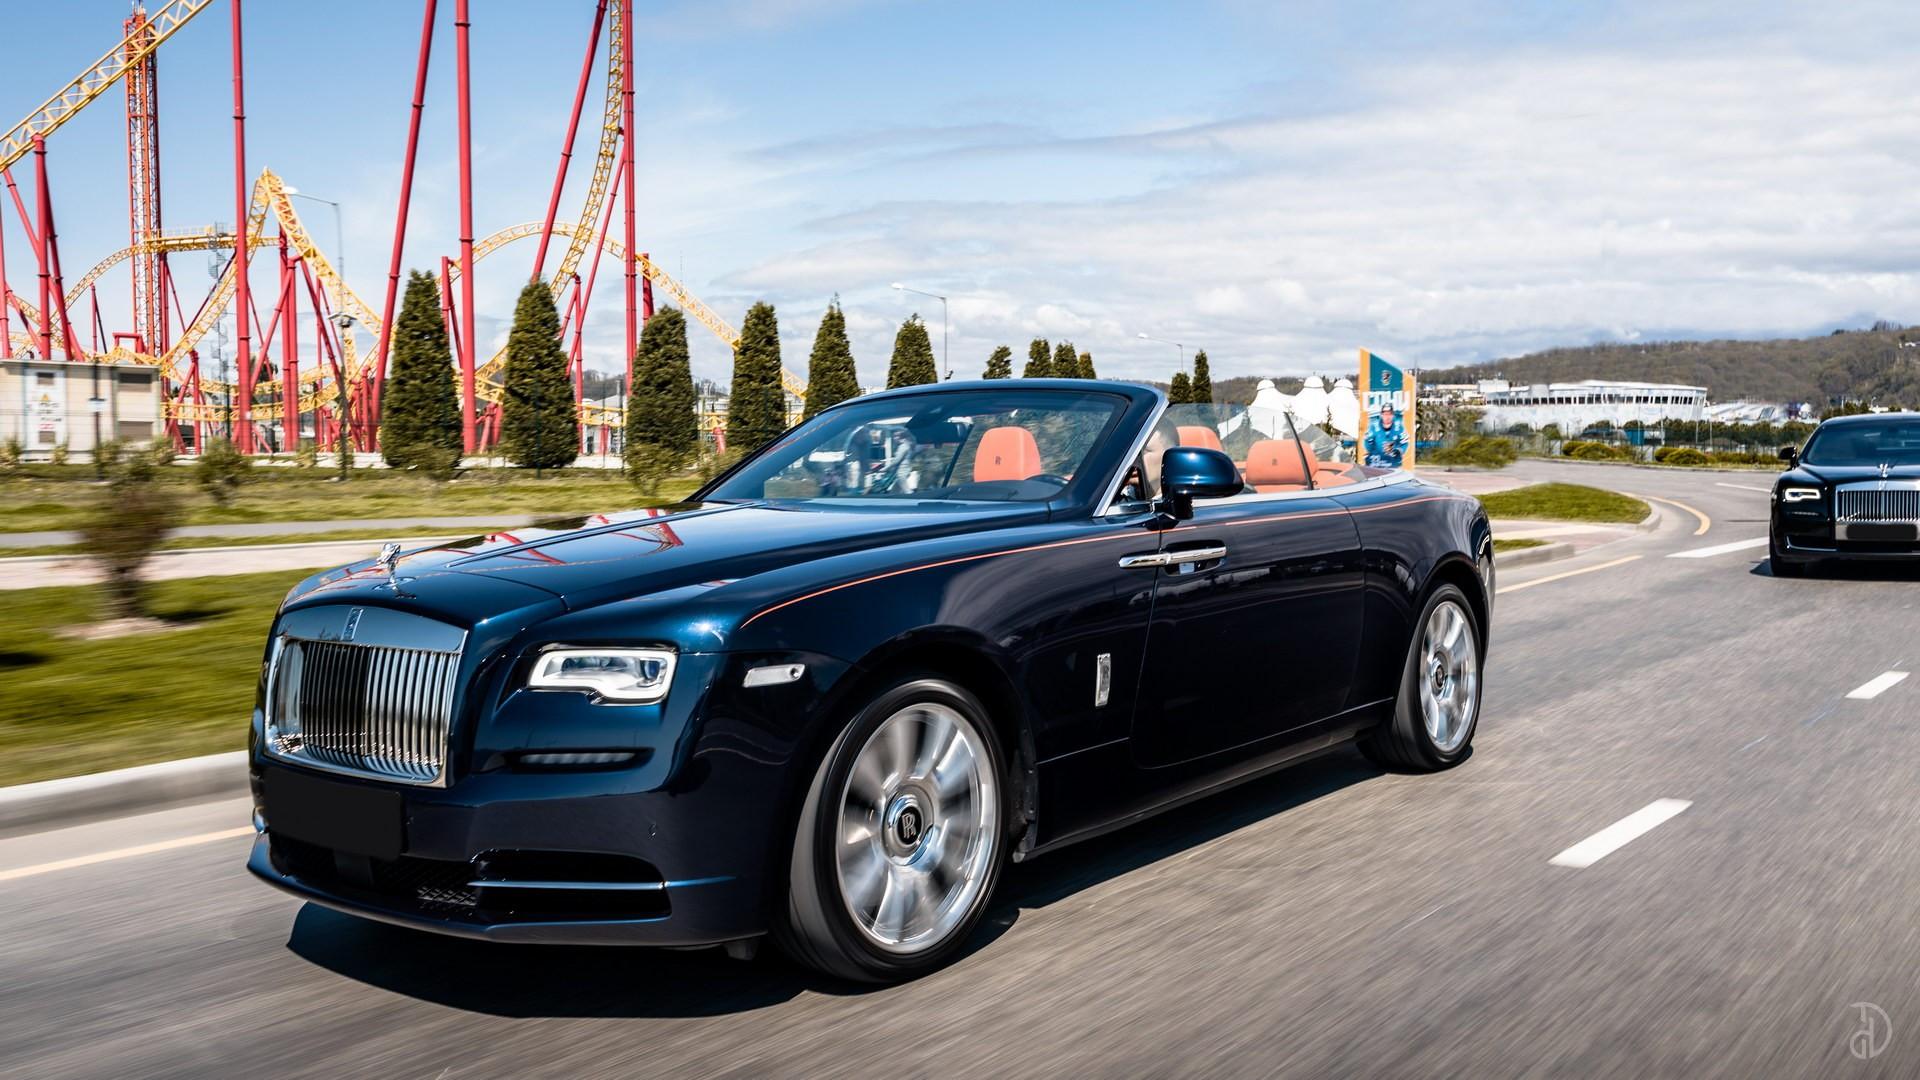 Аренда Rolls-Royce Dawn в Сочи. Фото 3